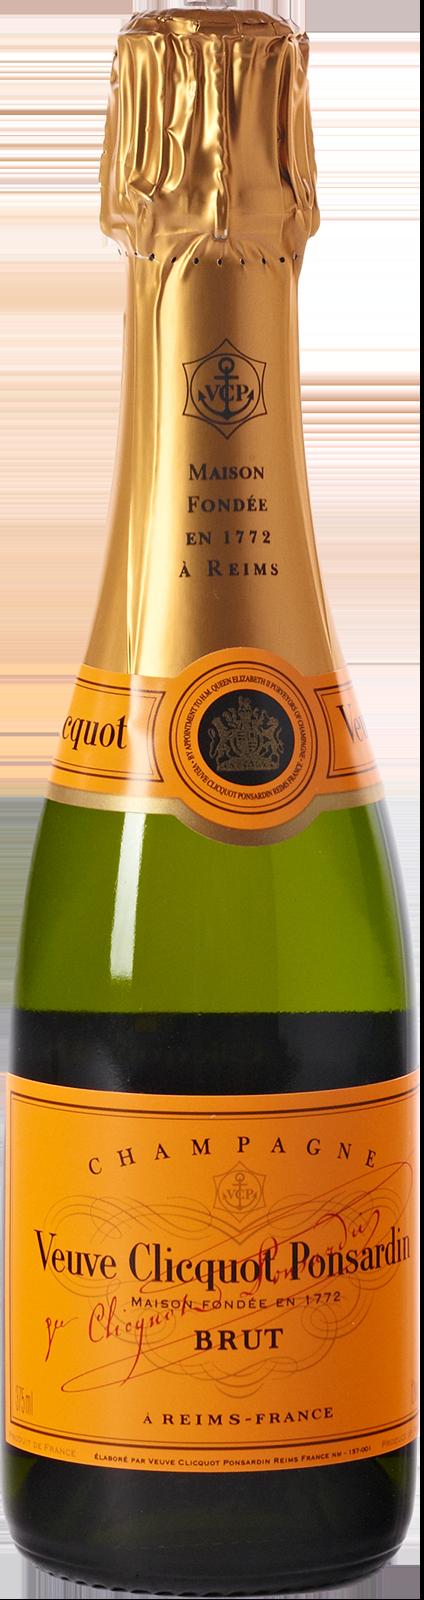 NV-Veuve Clicquot Brut Halve